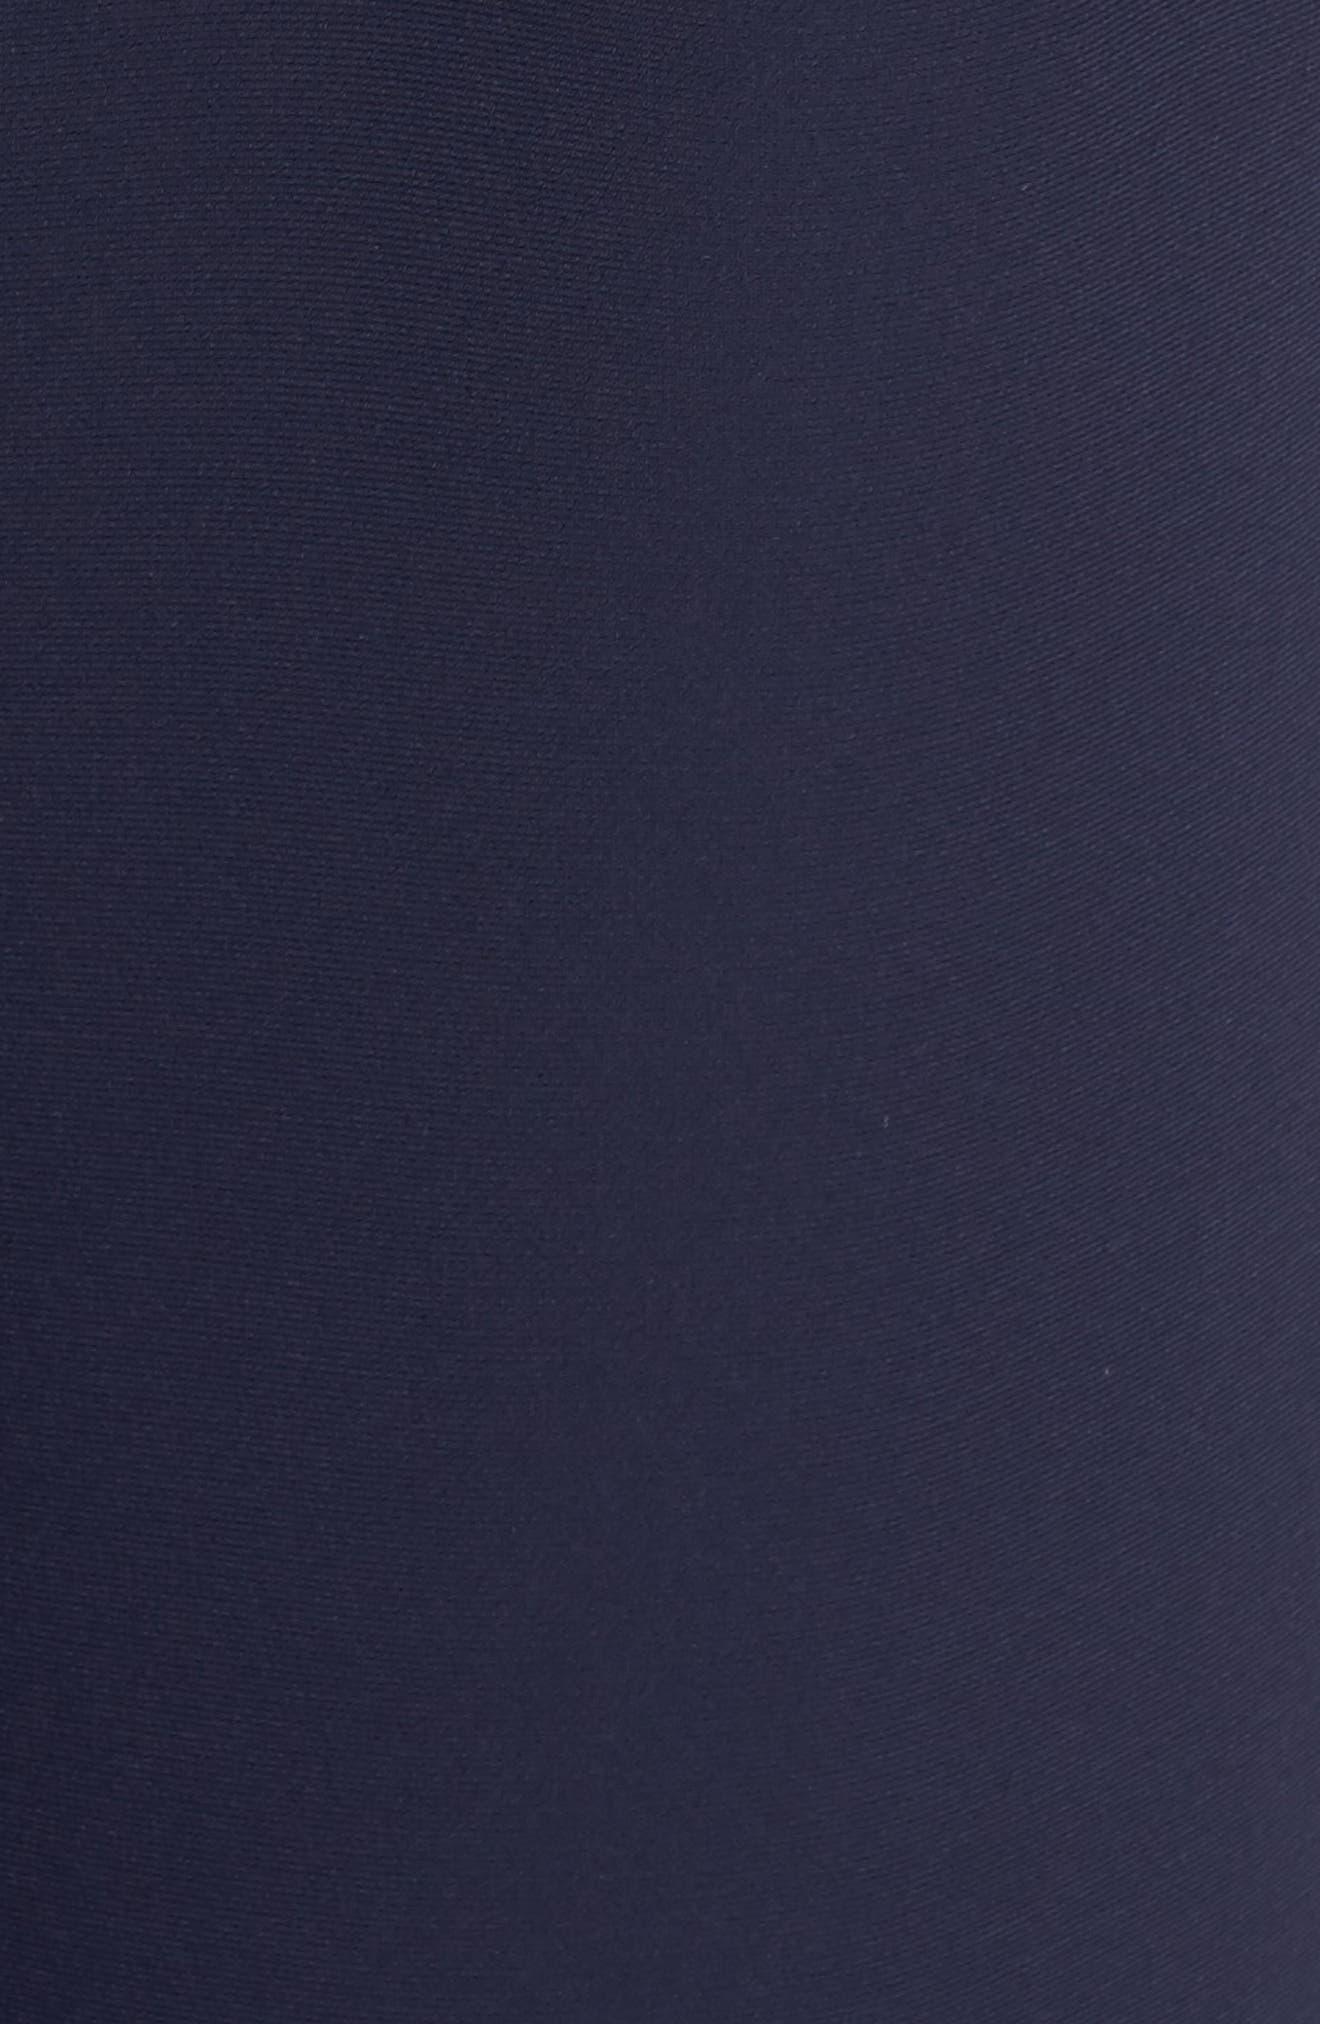 VINCE CAMUTO, Ruffle Wide Leg Crop Jumpsuit, Alternate thumbnail 6, color, NAVY